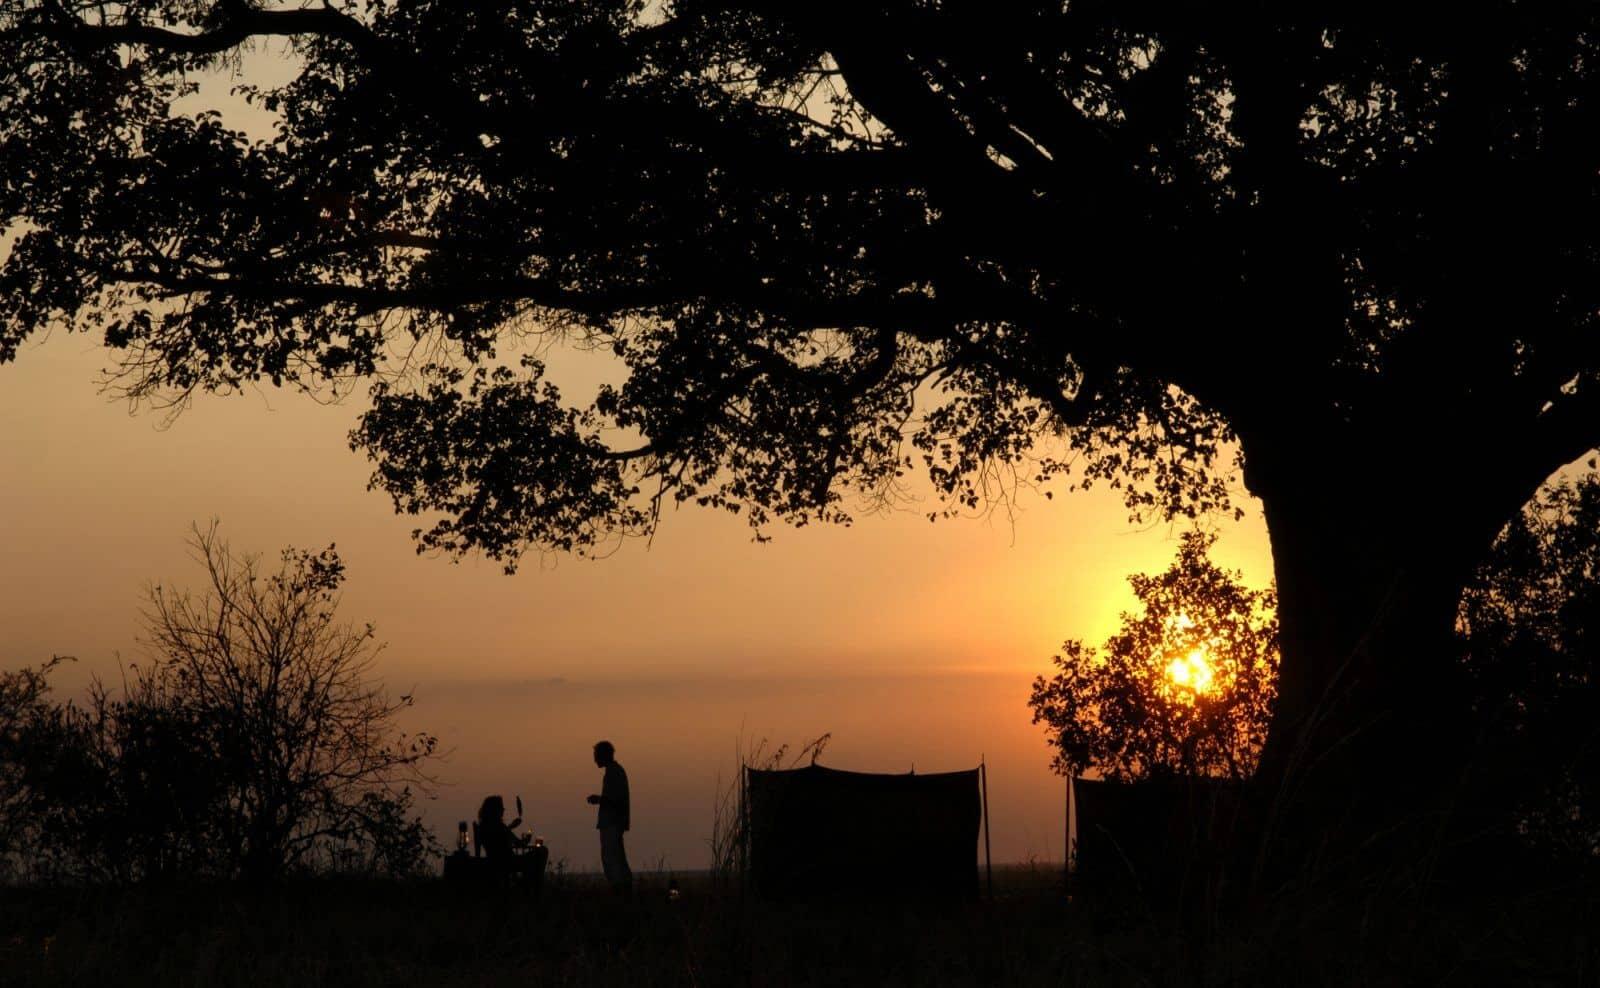 Sunset Chada Katavi © Nomad Tanzania